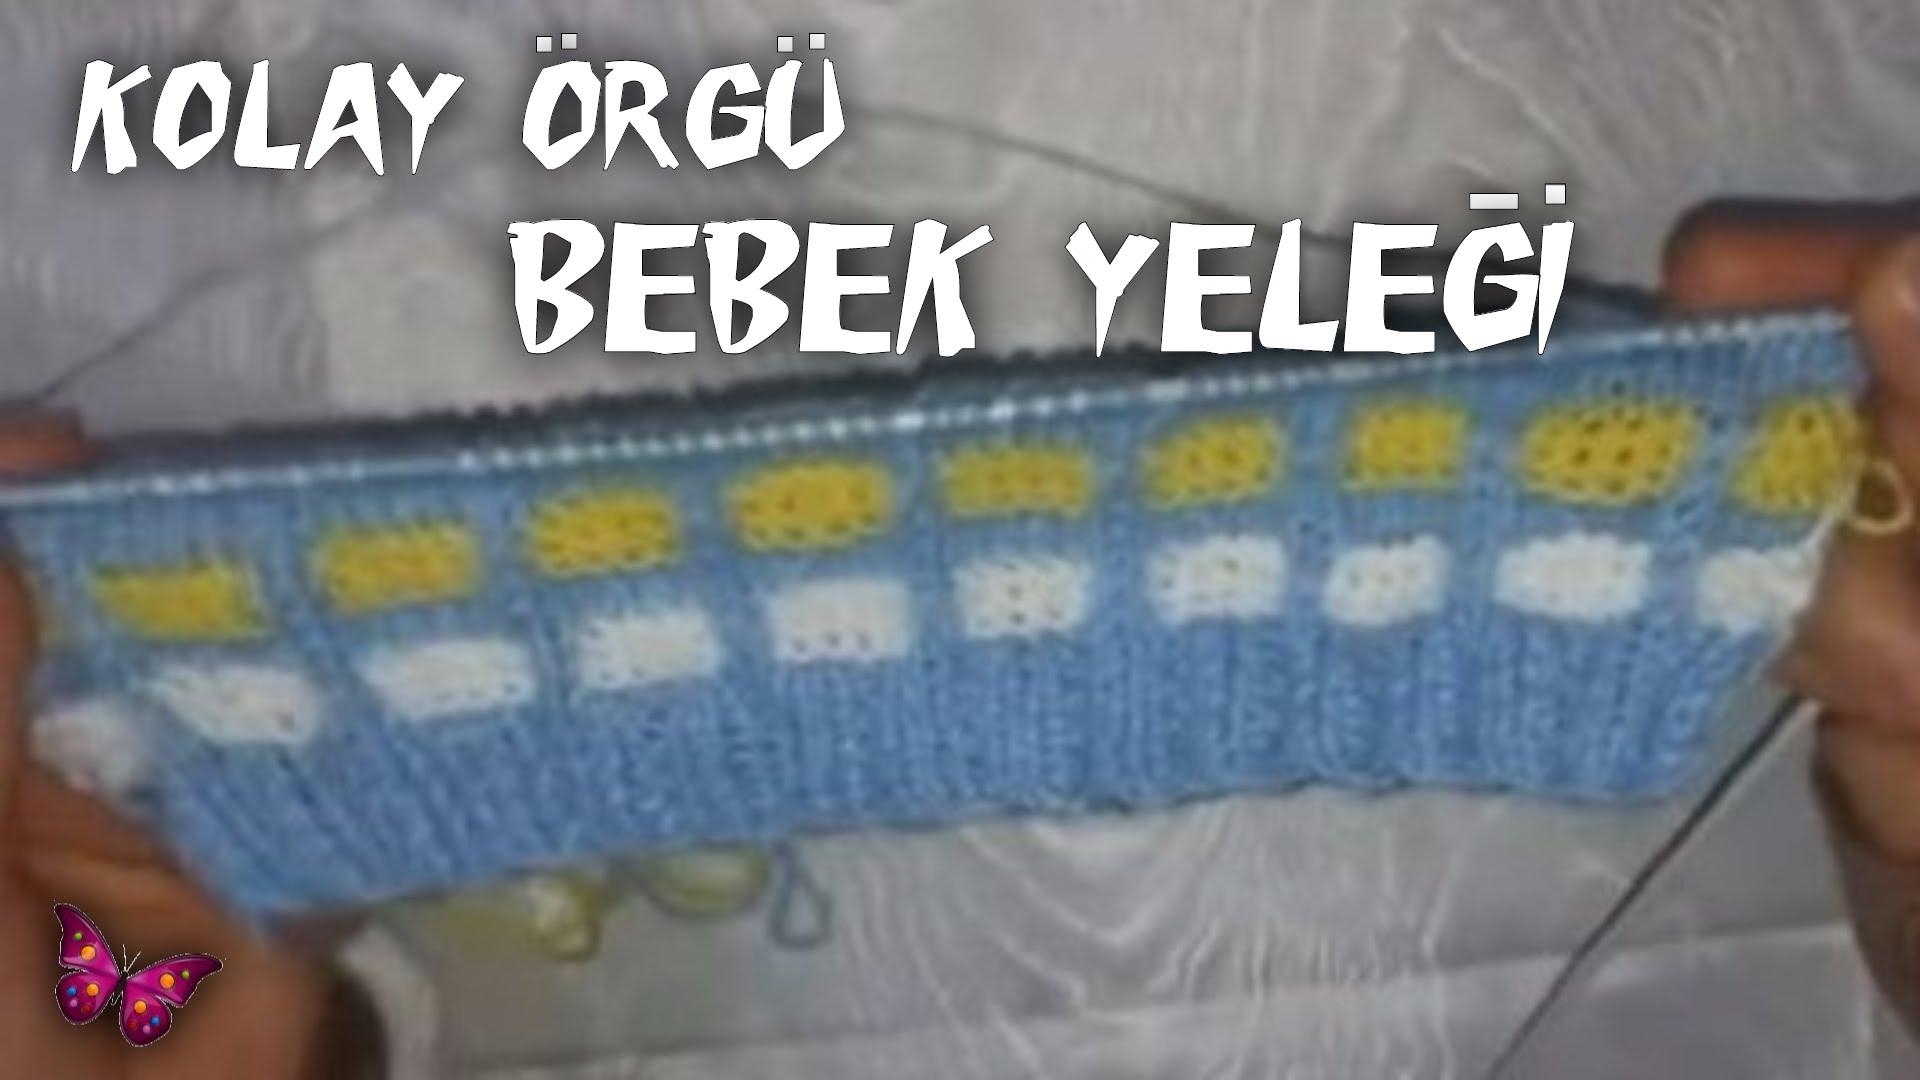 c449d7d06 Easy to weave knit - Baby vest (The Basics) - Knitting